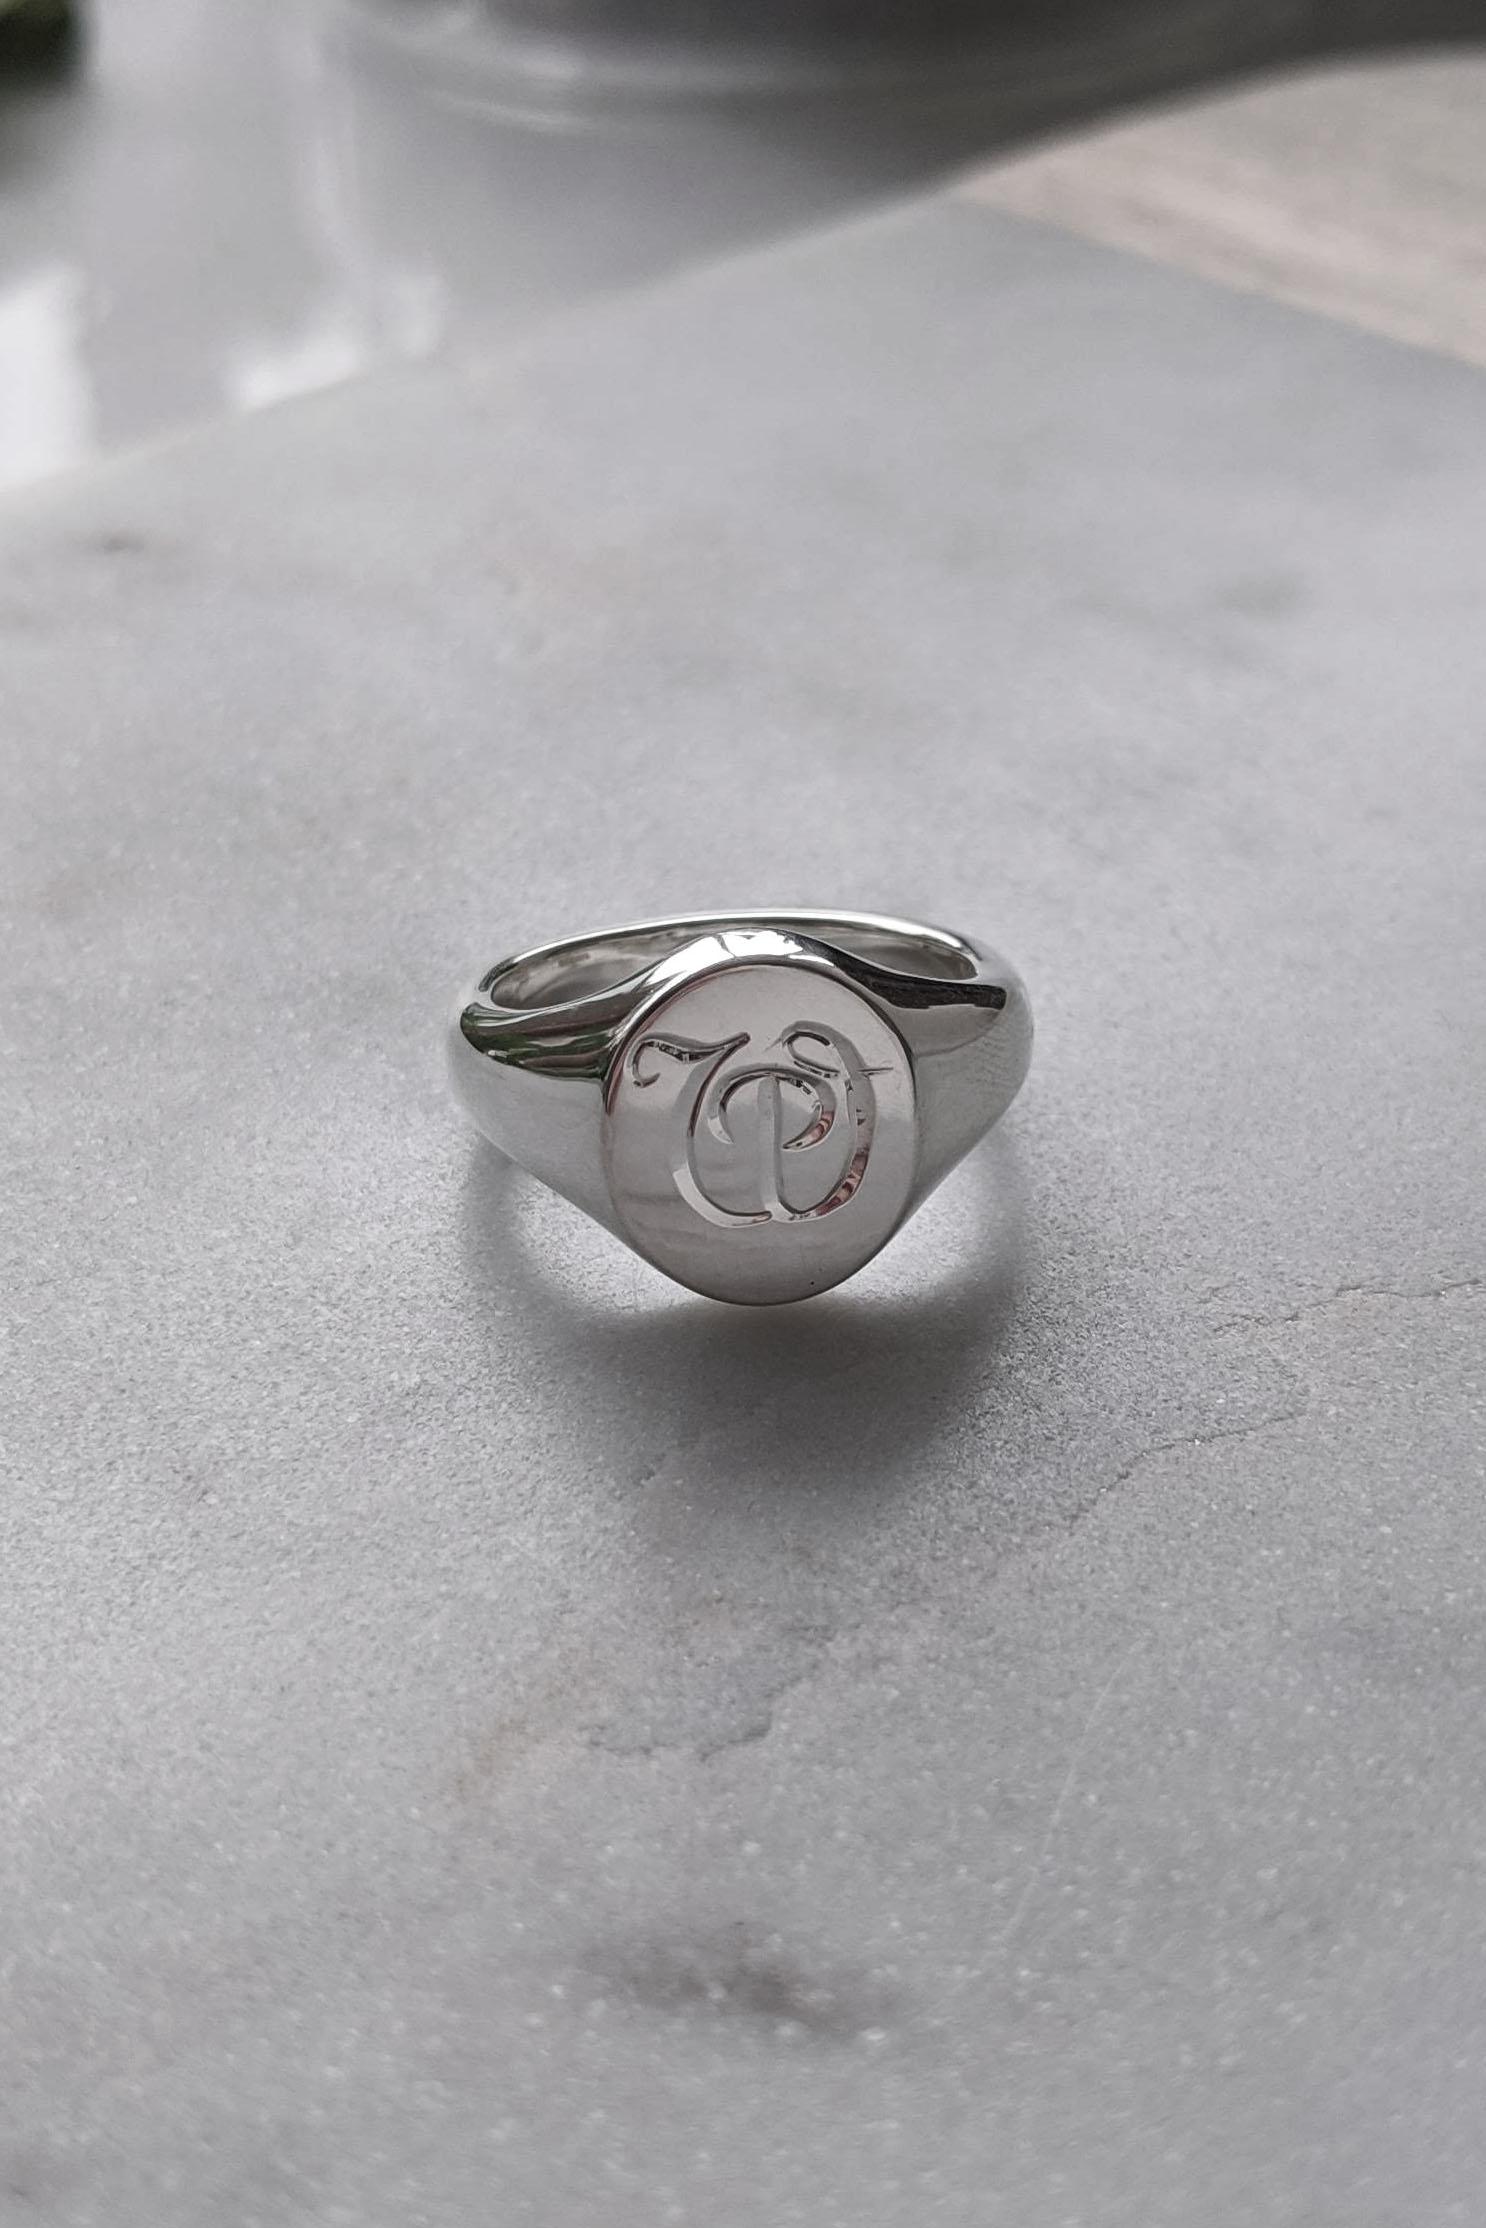 silver signet ring.jpg